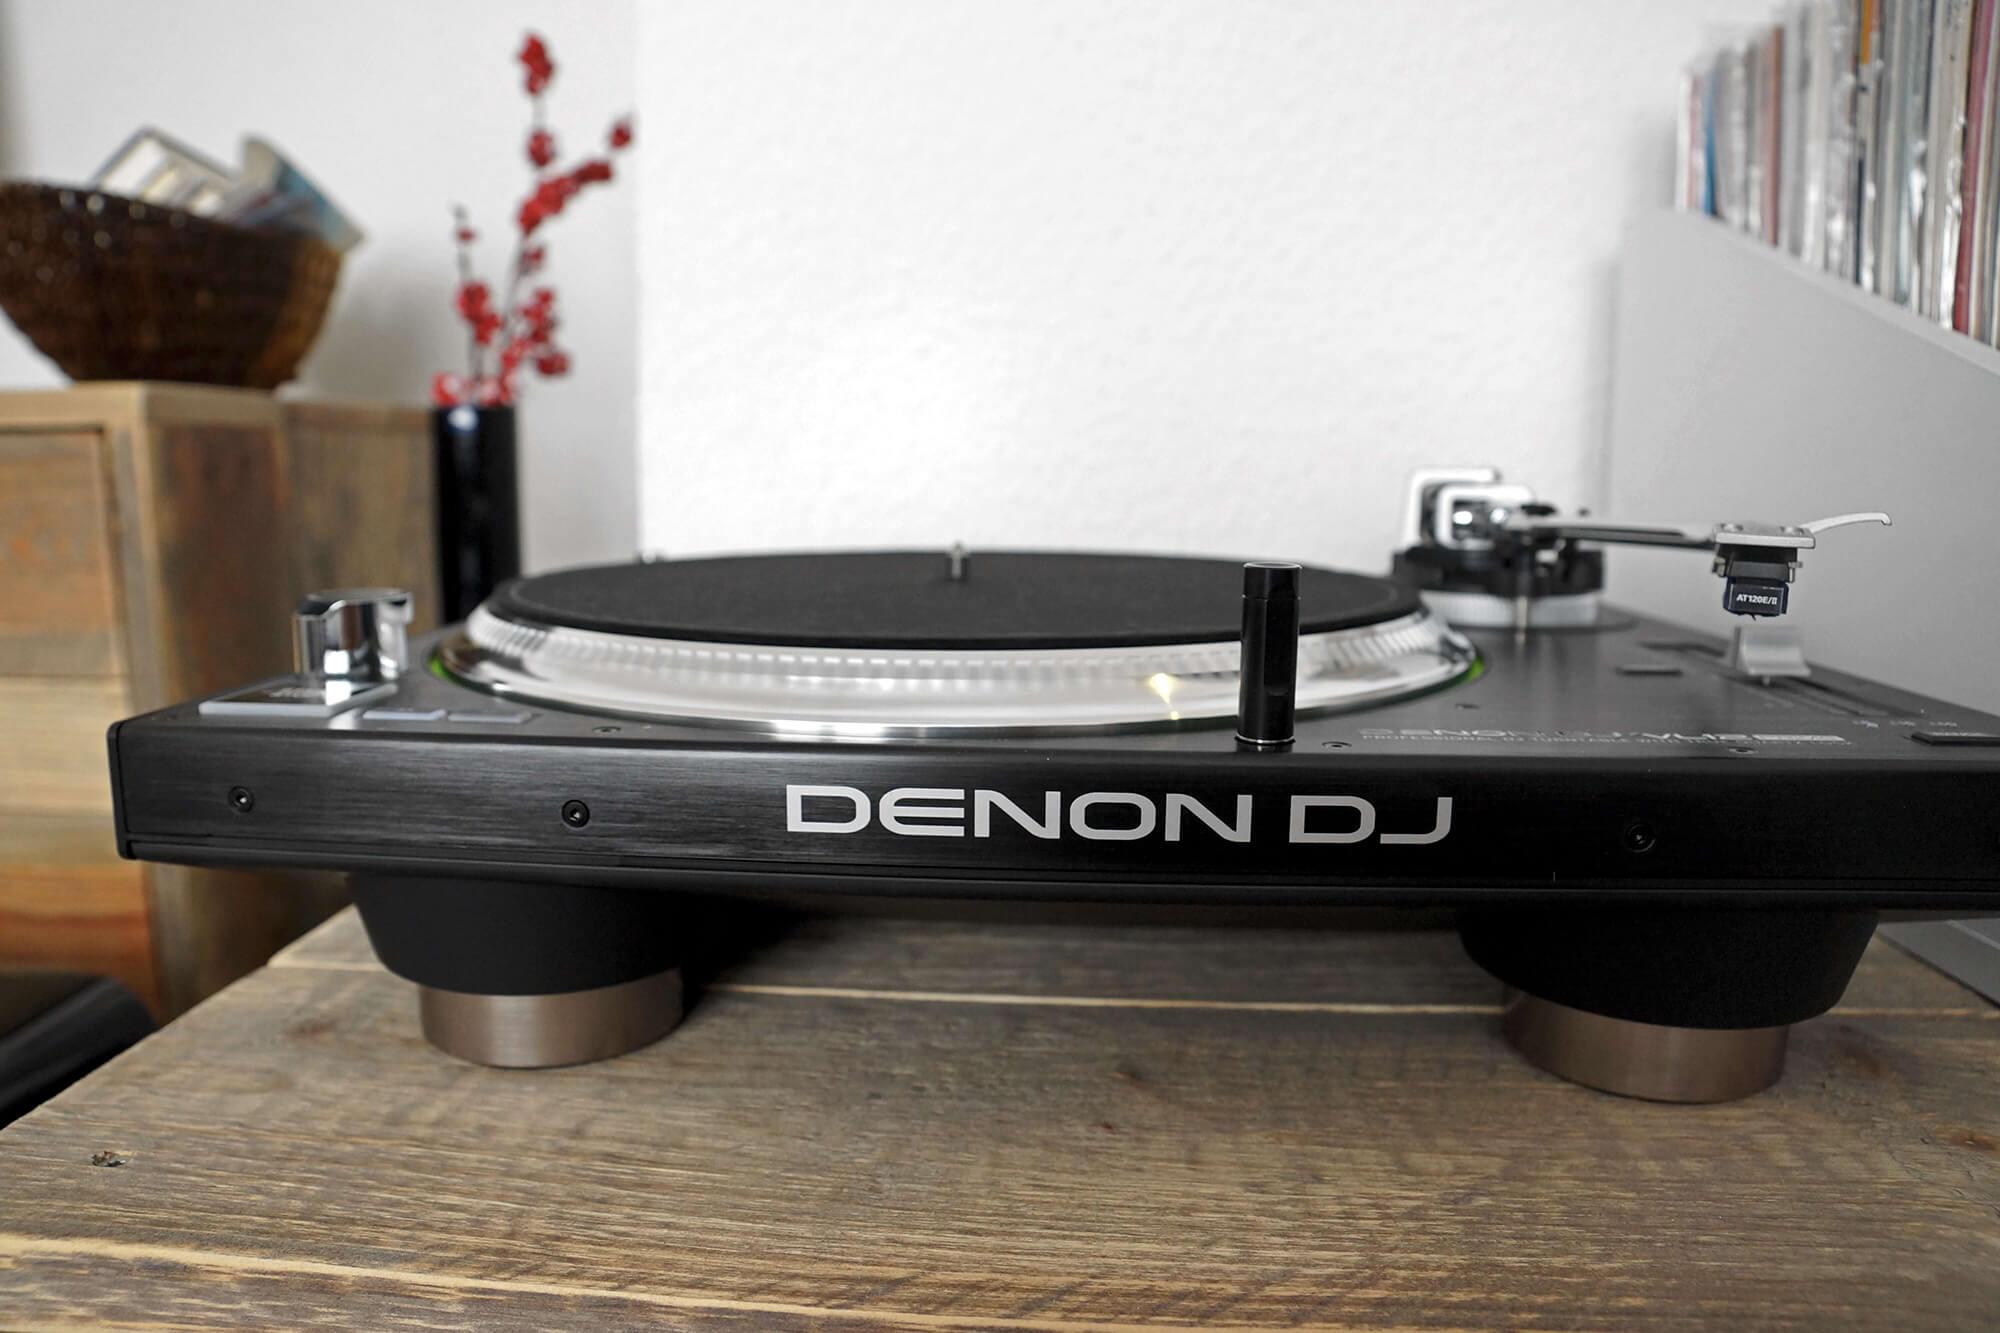 Sonos Vinyl: Denon DJ VL12 Prime Test 8 techboys.de • smarte News, auf den Punkt! Sonos Vinyl: Denon DJ VL12 Prime Test